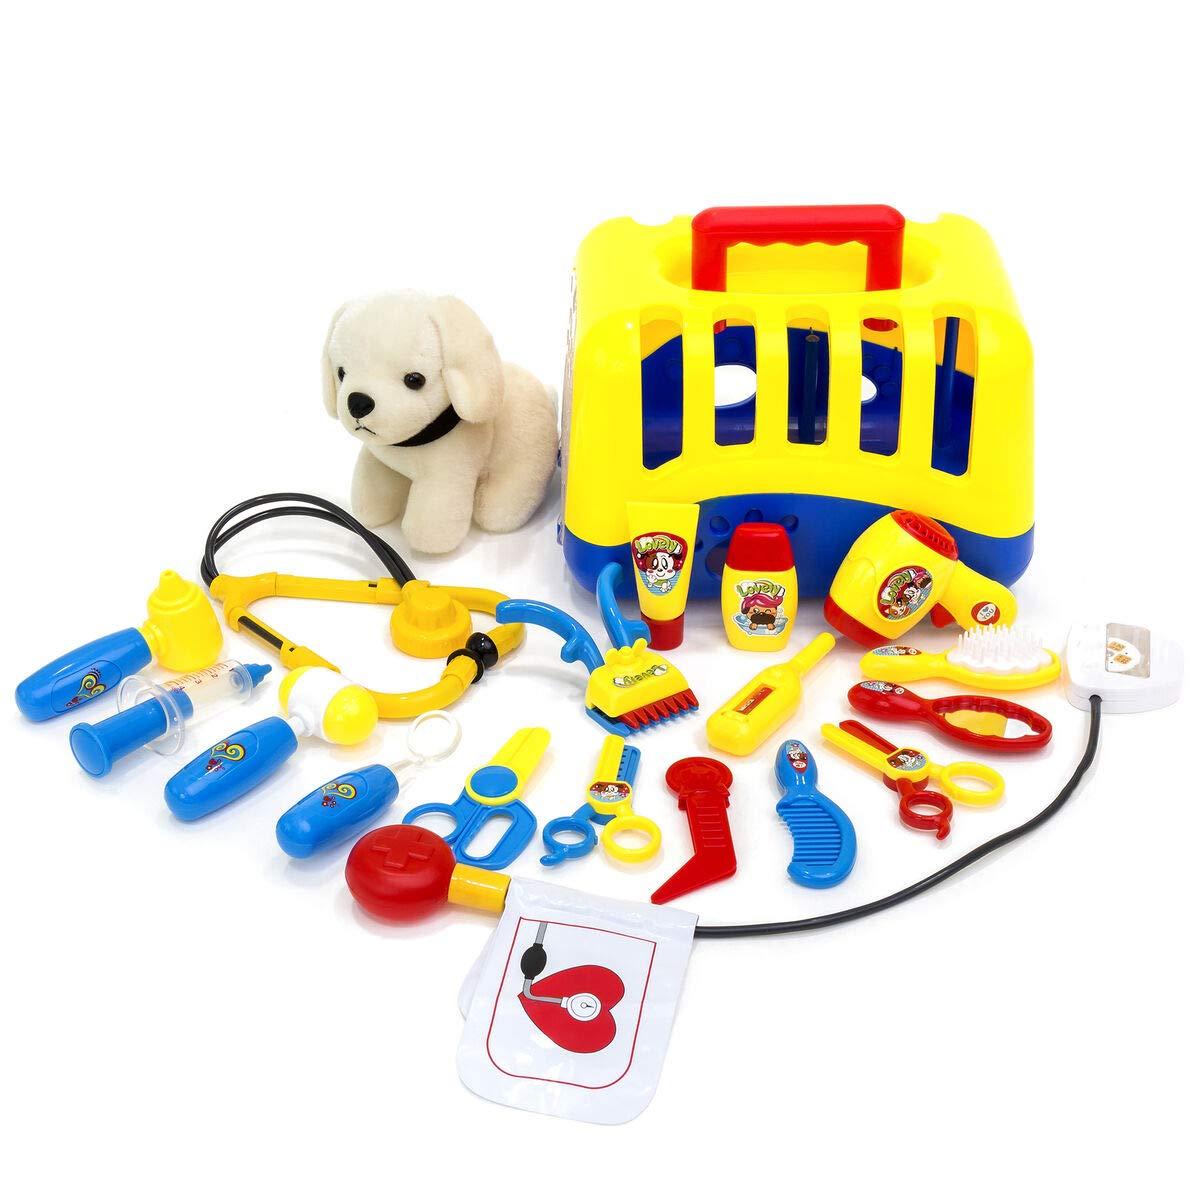 20-Piece Kids Dog Vet Groomer Set w/ Puppy Plush, Carrier, Tools, Best Children's Toys 2019